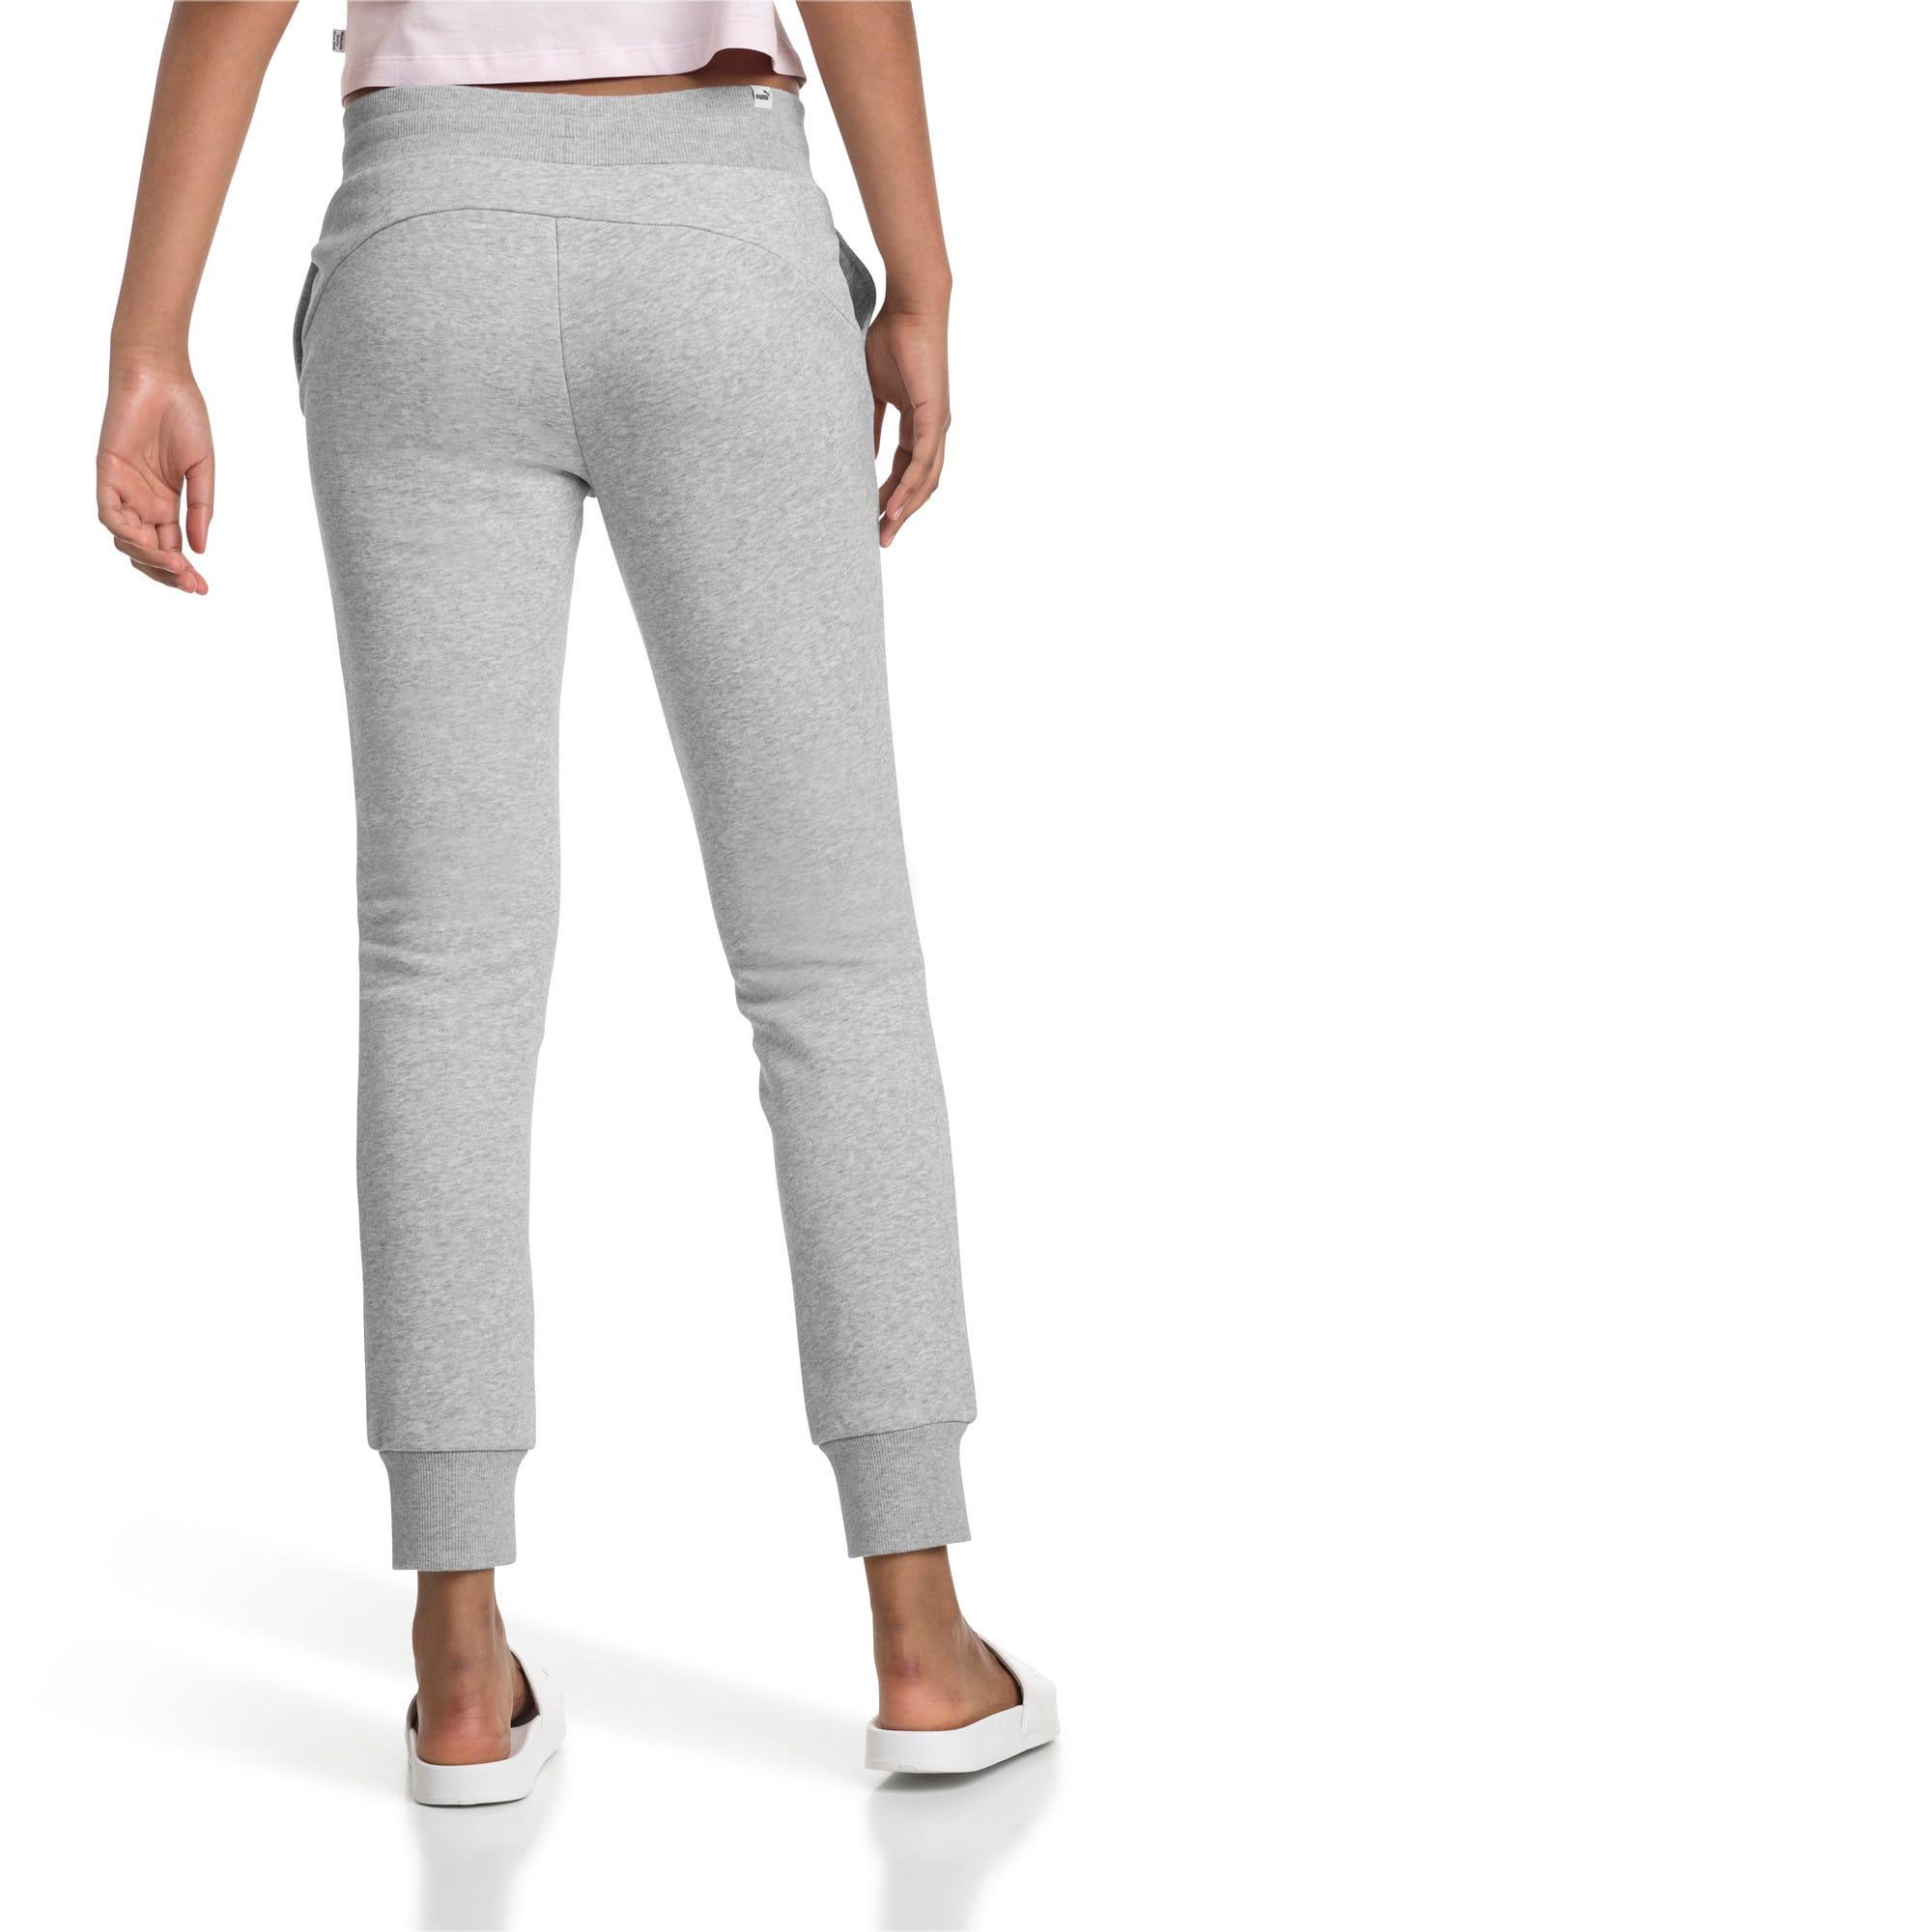 Thumbnail 2 of Essentials Fleece Women's Pants, Light Gray Heather, medium